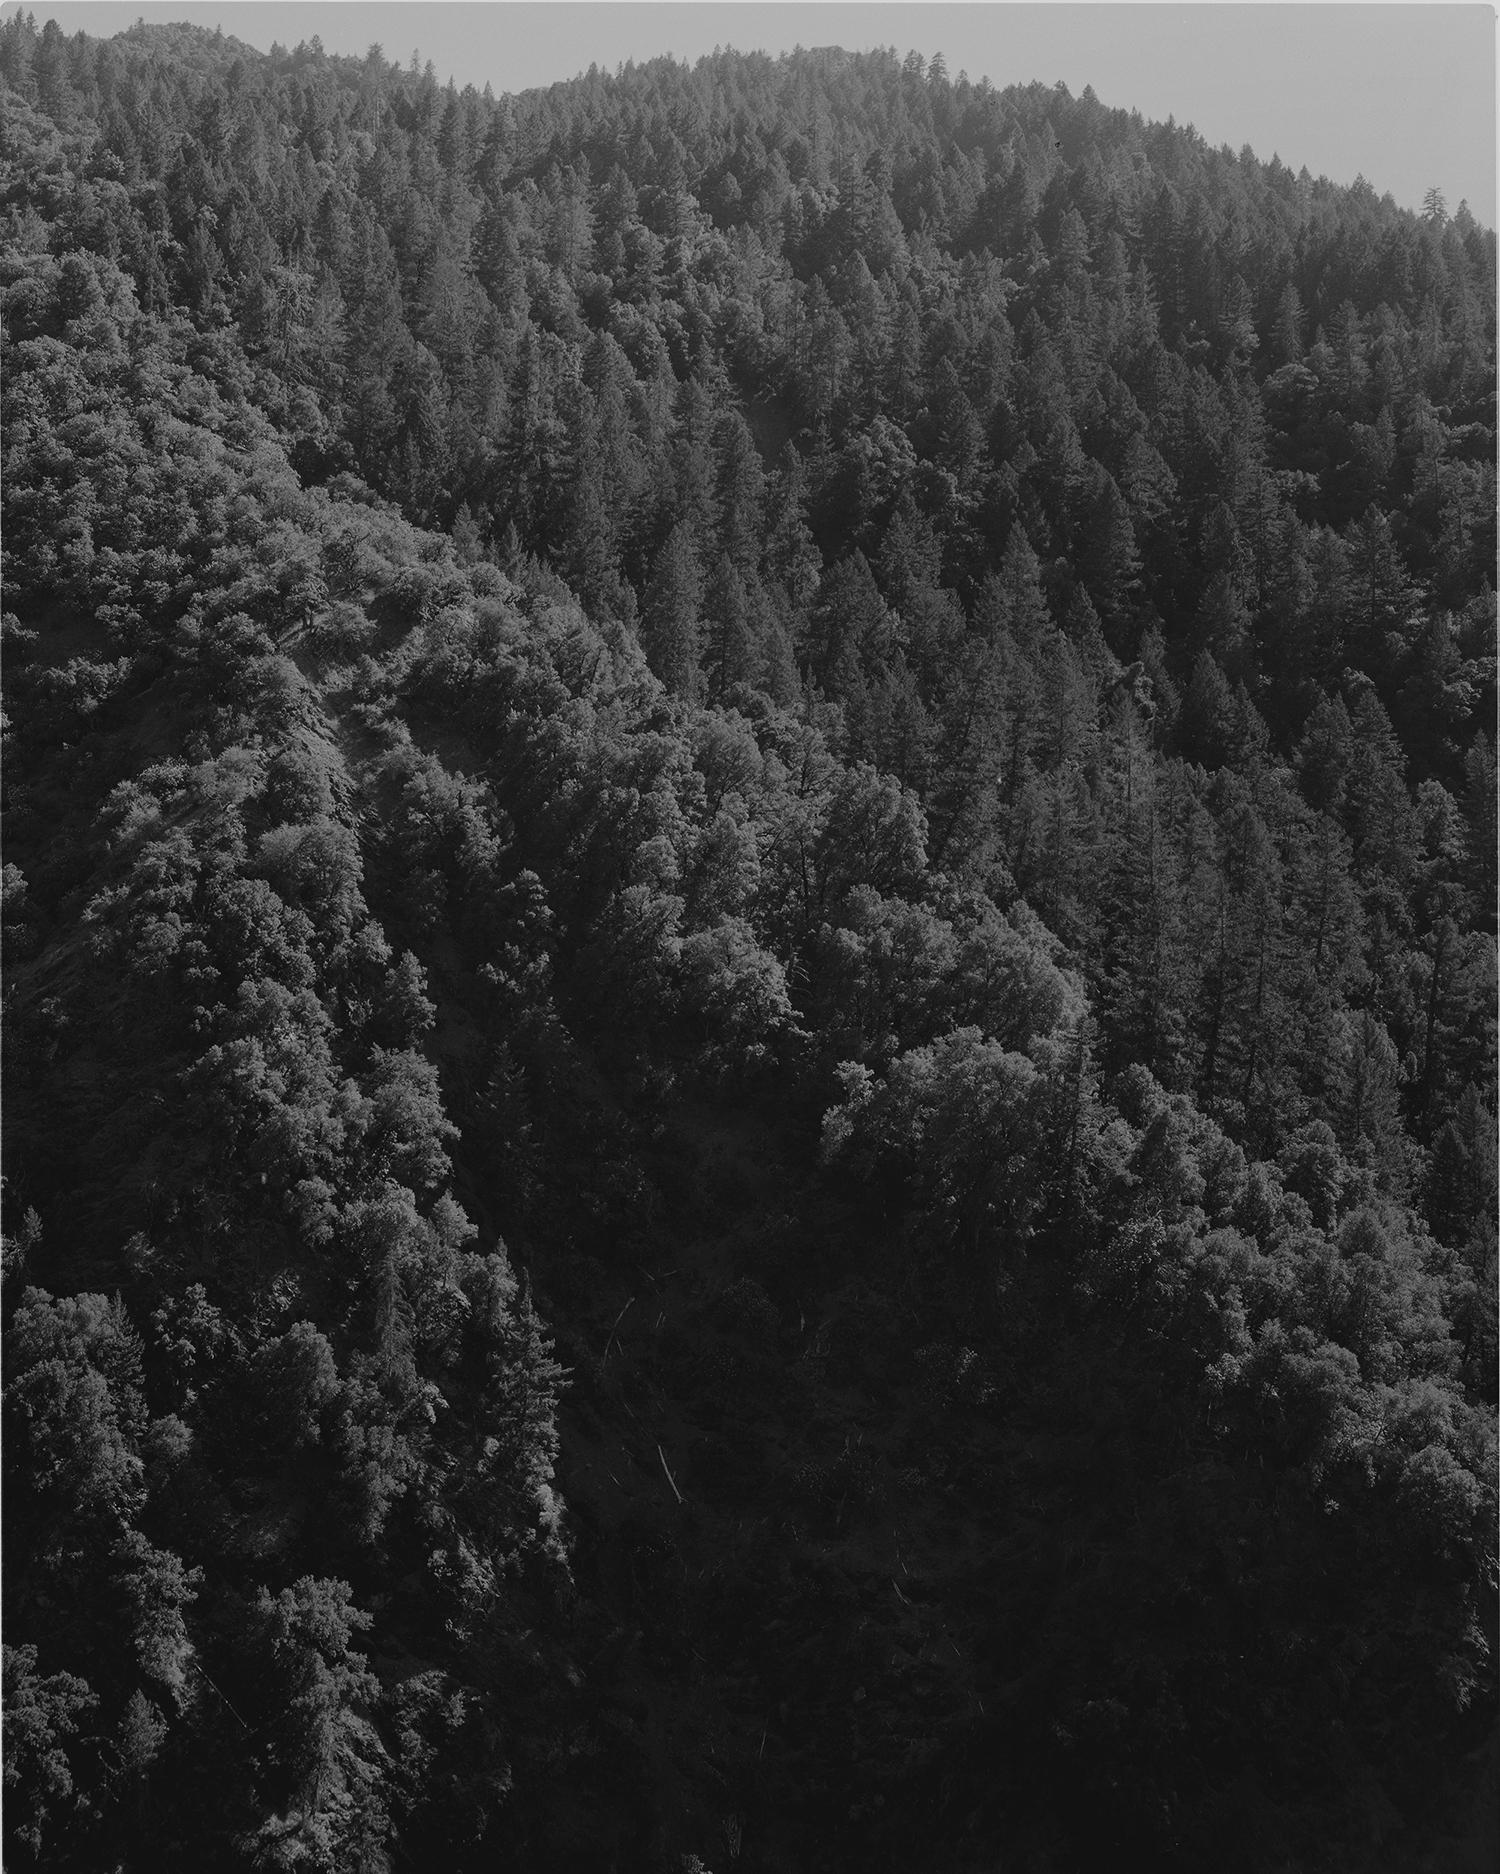 Richard Wilson's woods.